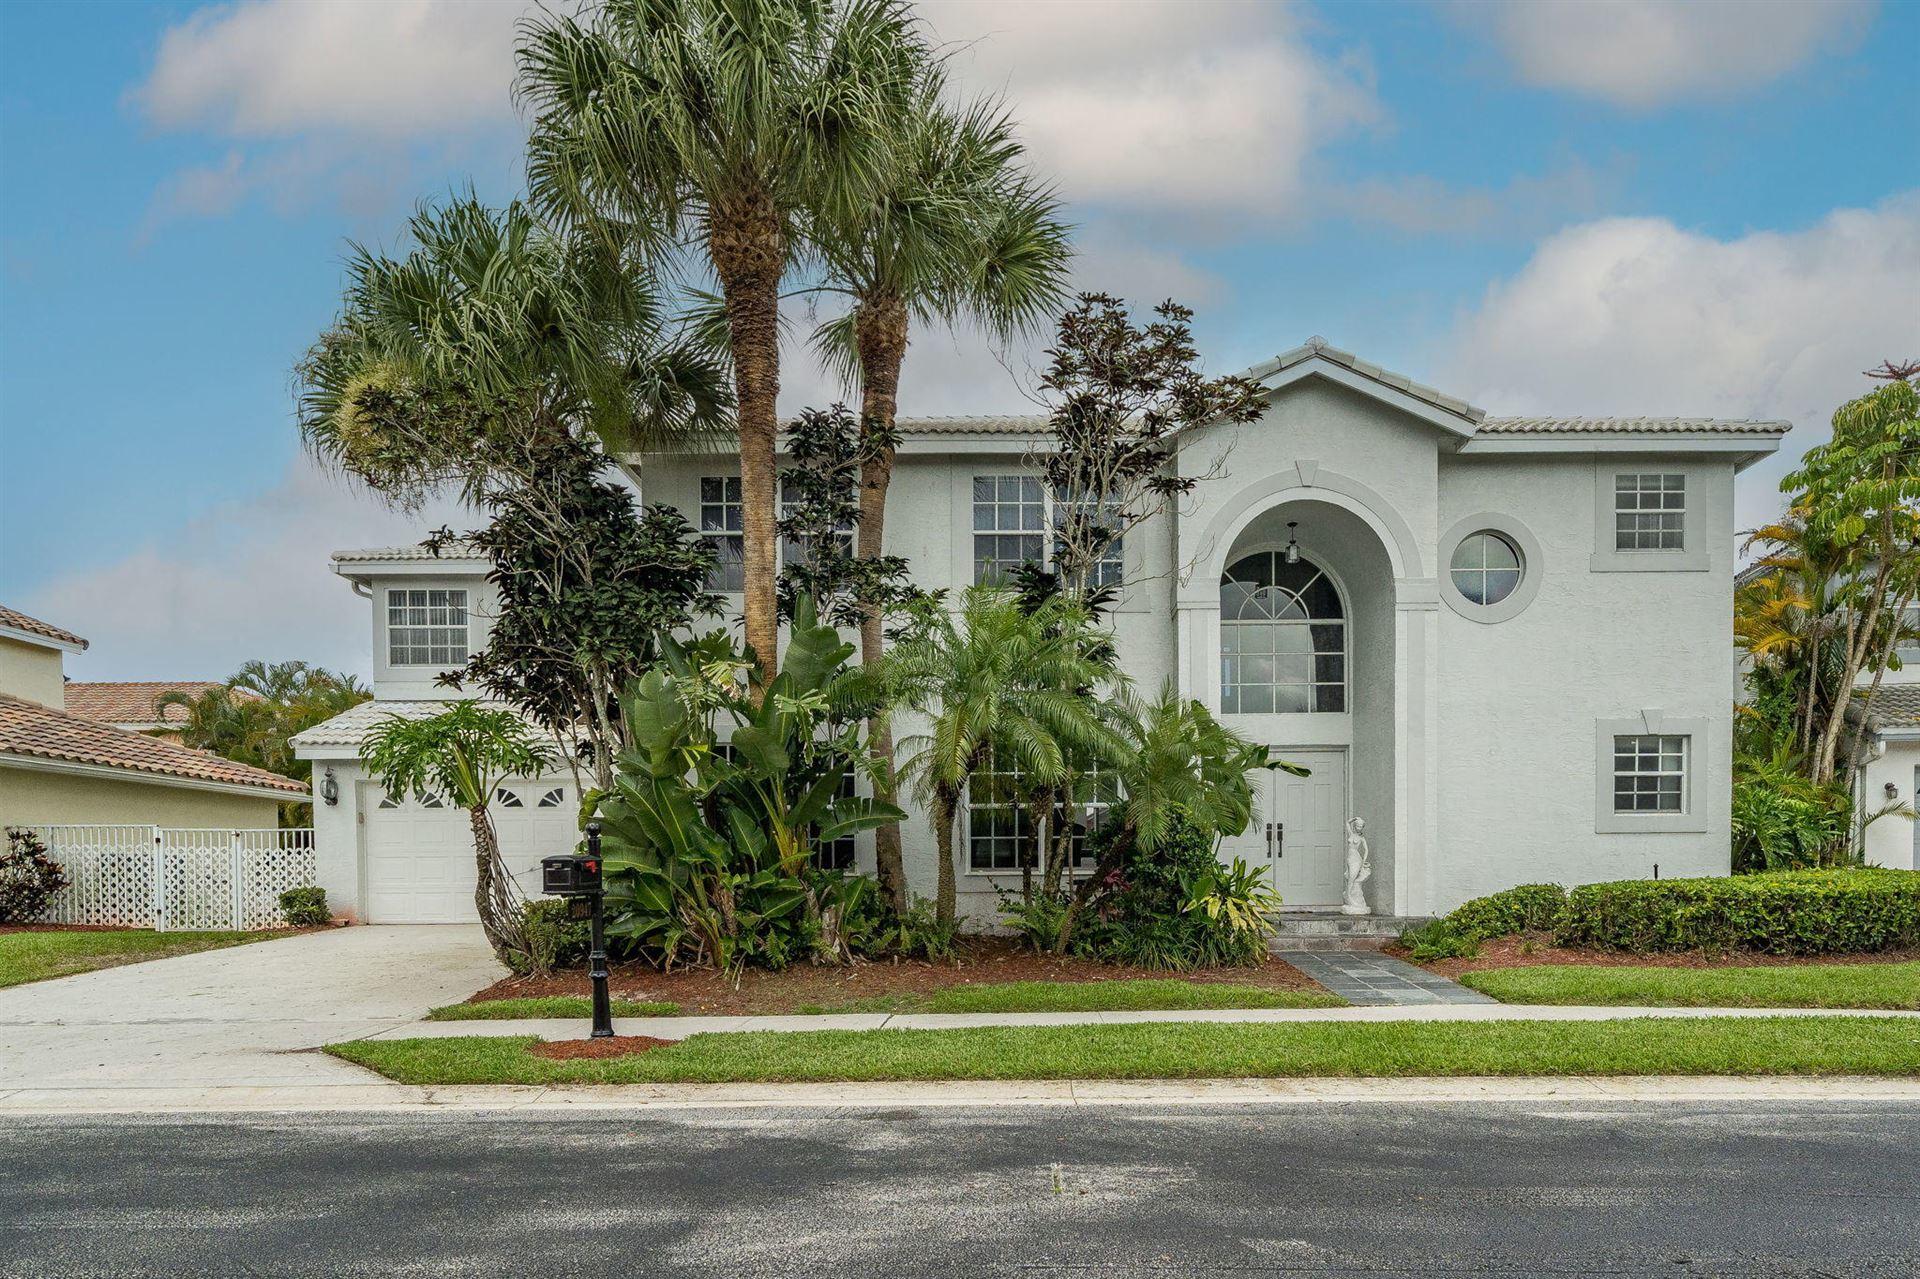 20947 Spinnaker Way, Boca Raton, FL 33428 - MLS#: RX-10730516